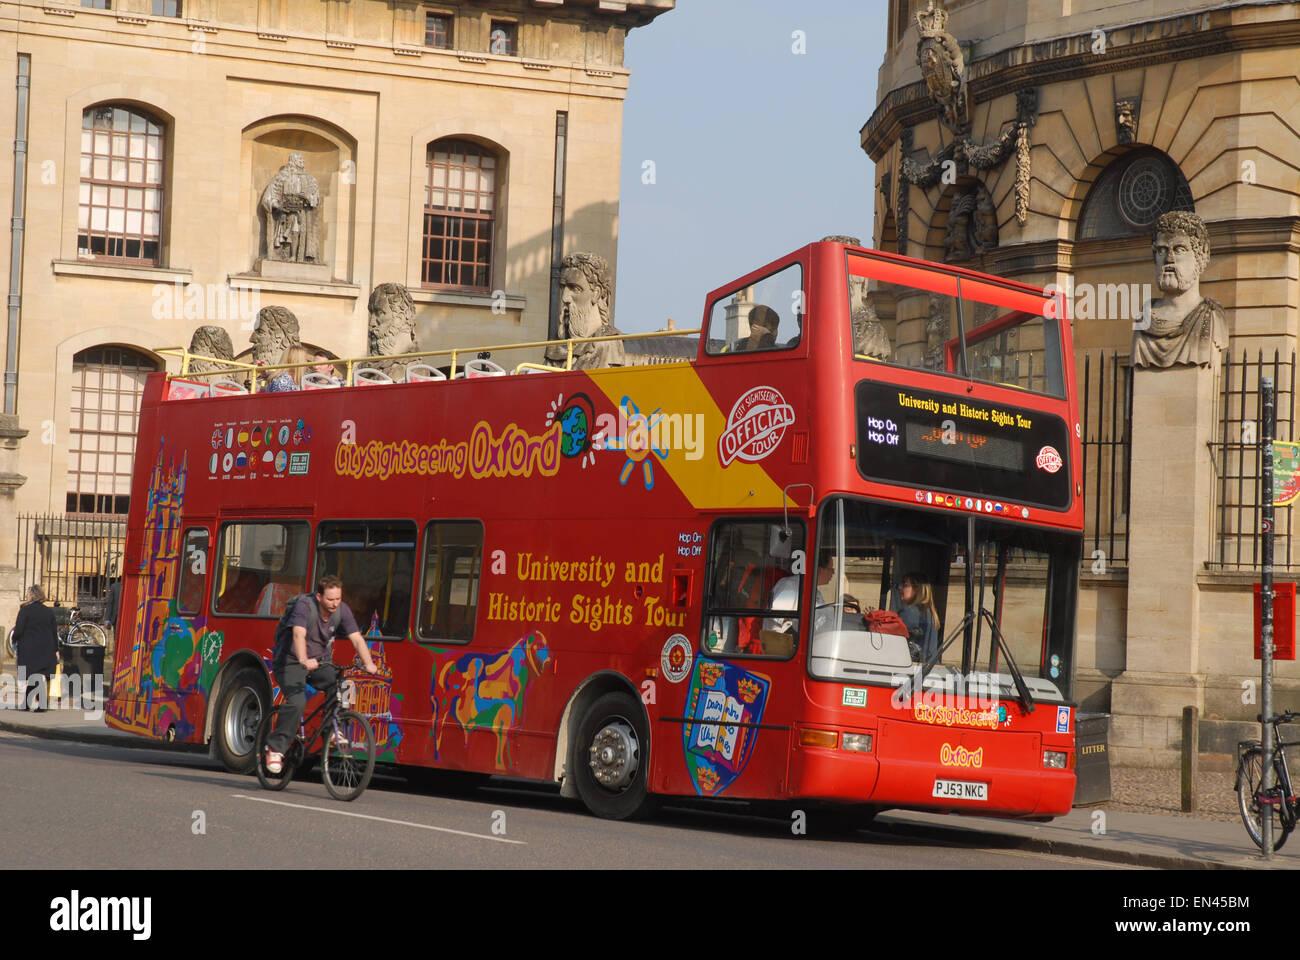 Open topped University & Historic Sights Tour Bus, Oxford, England Stock Photo